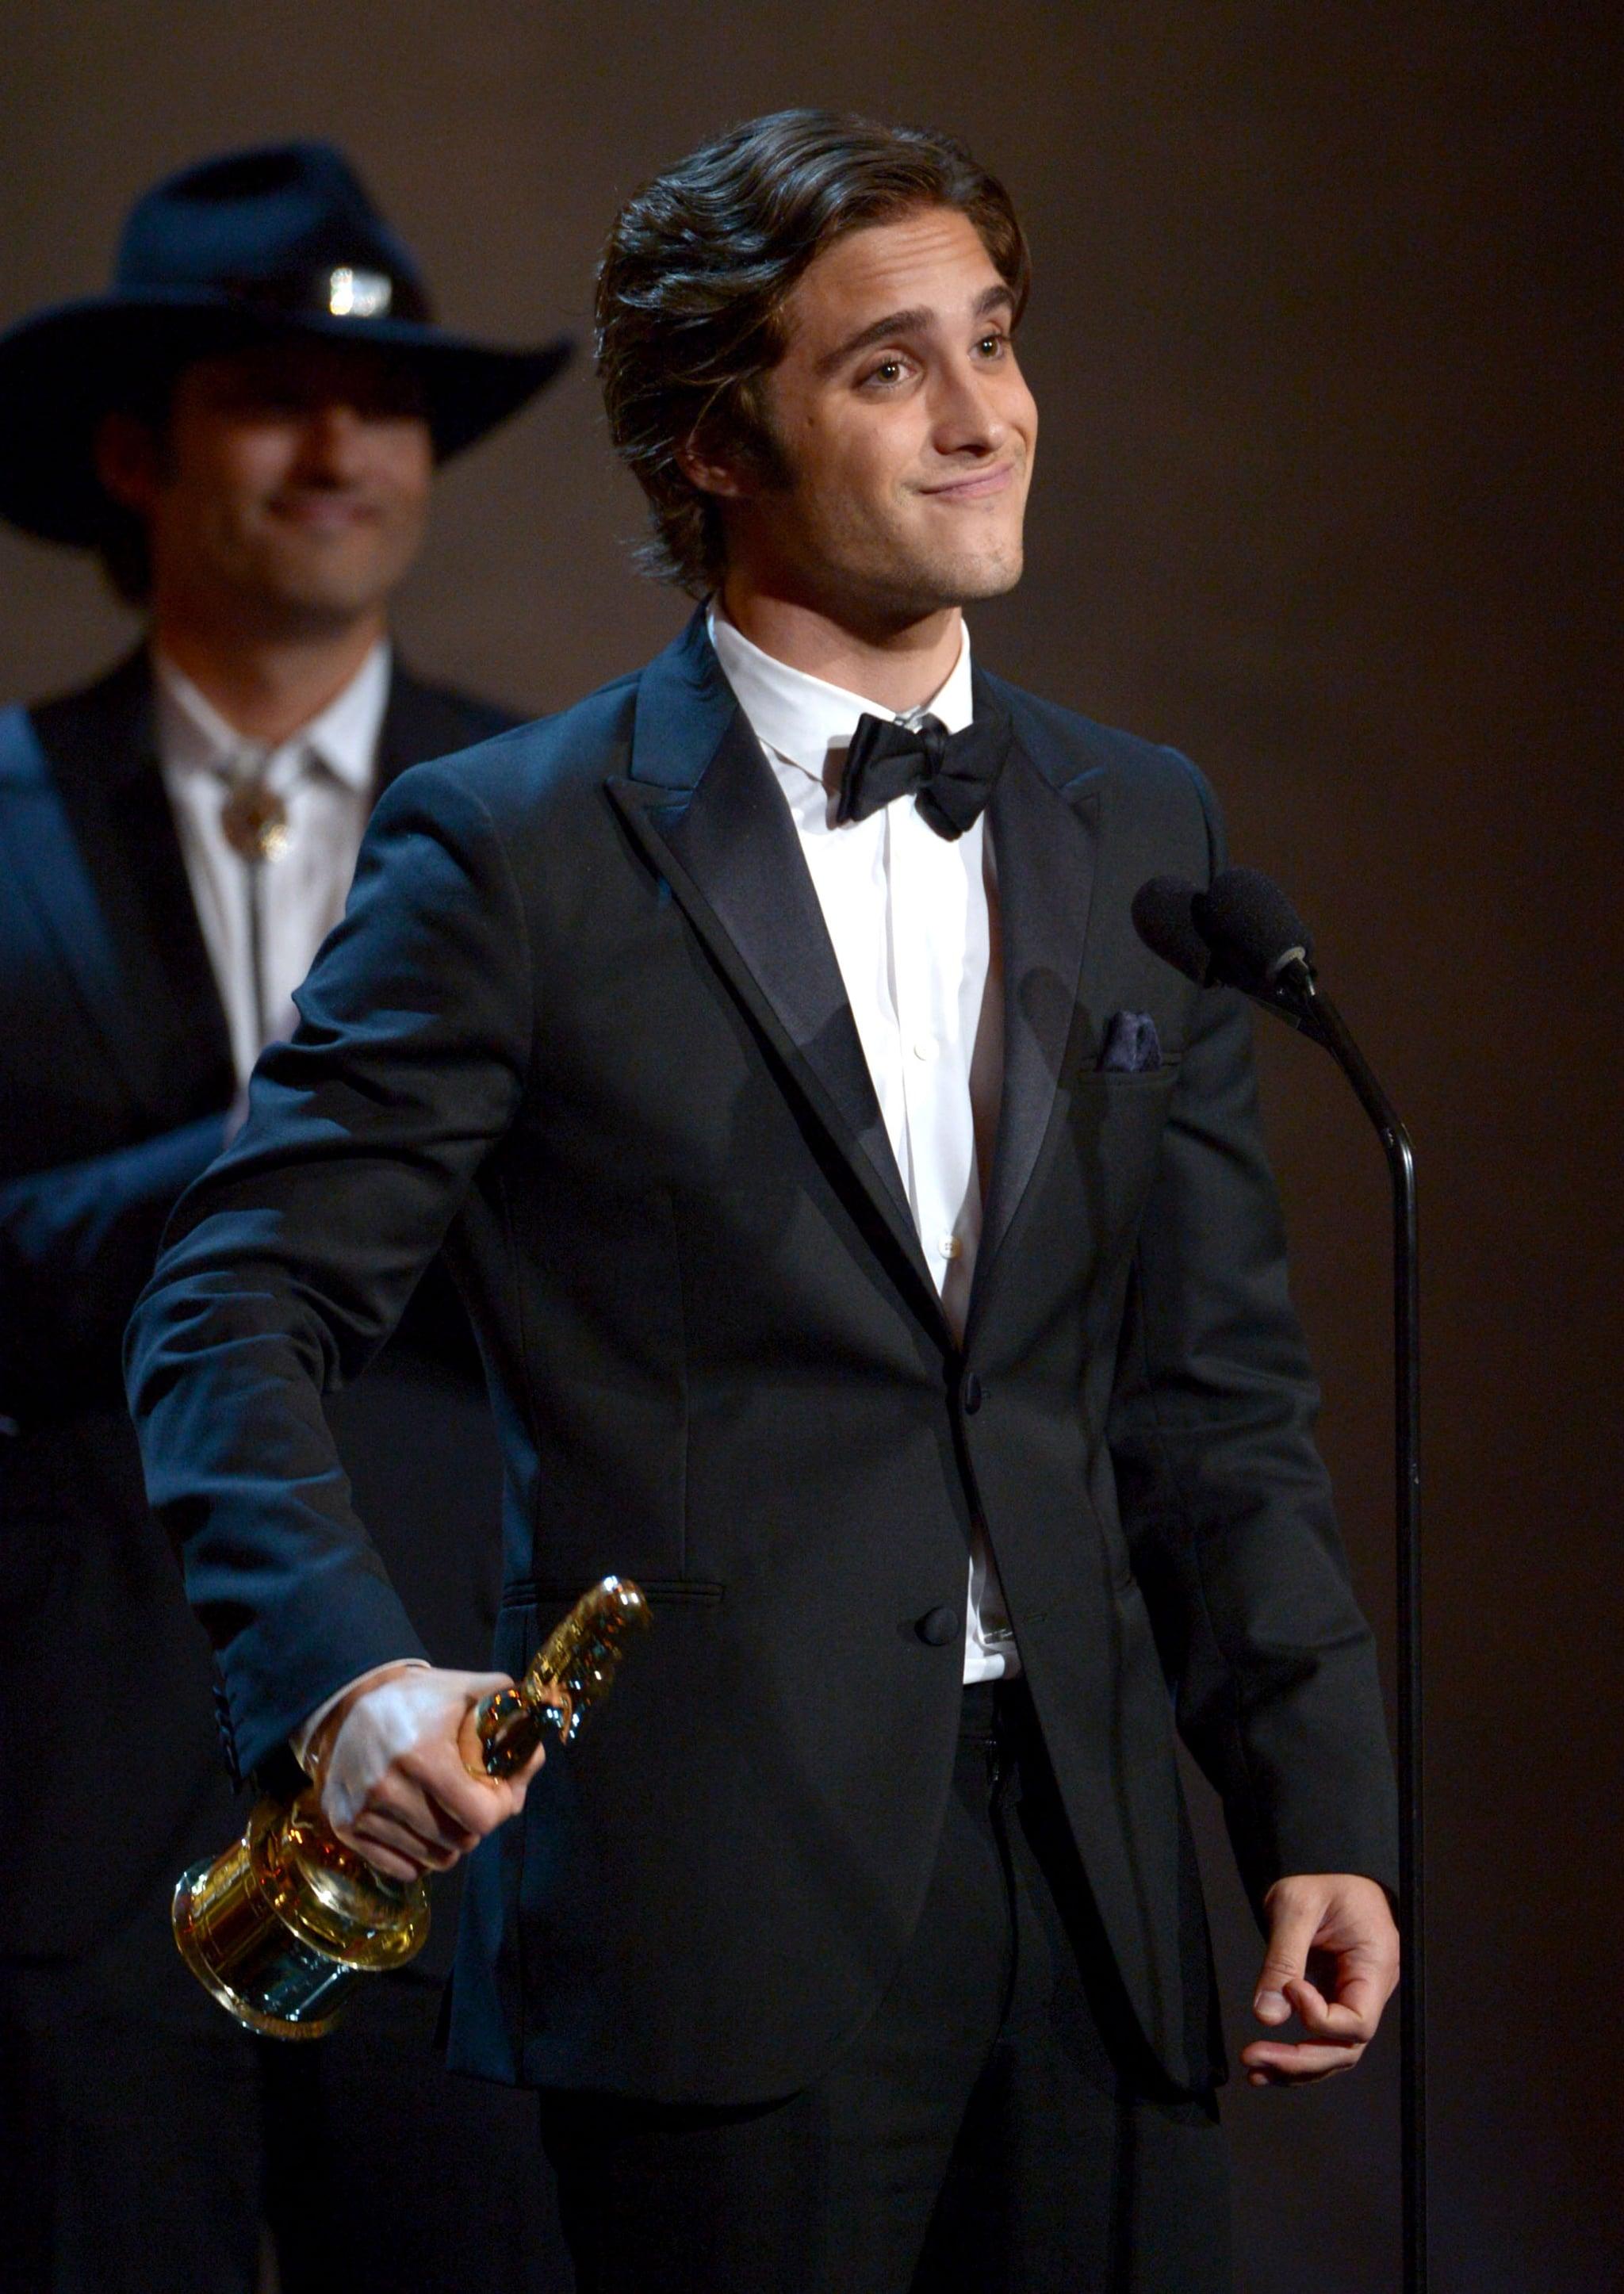 Christina, Ryan, and Zoe Win Big at the Star-Studded ALMA Awards